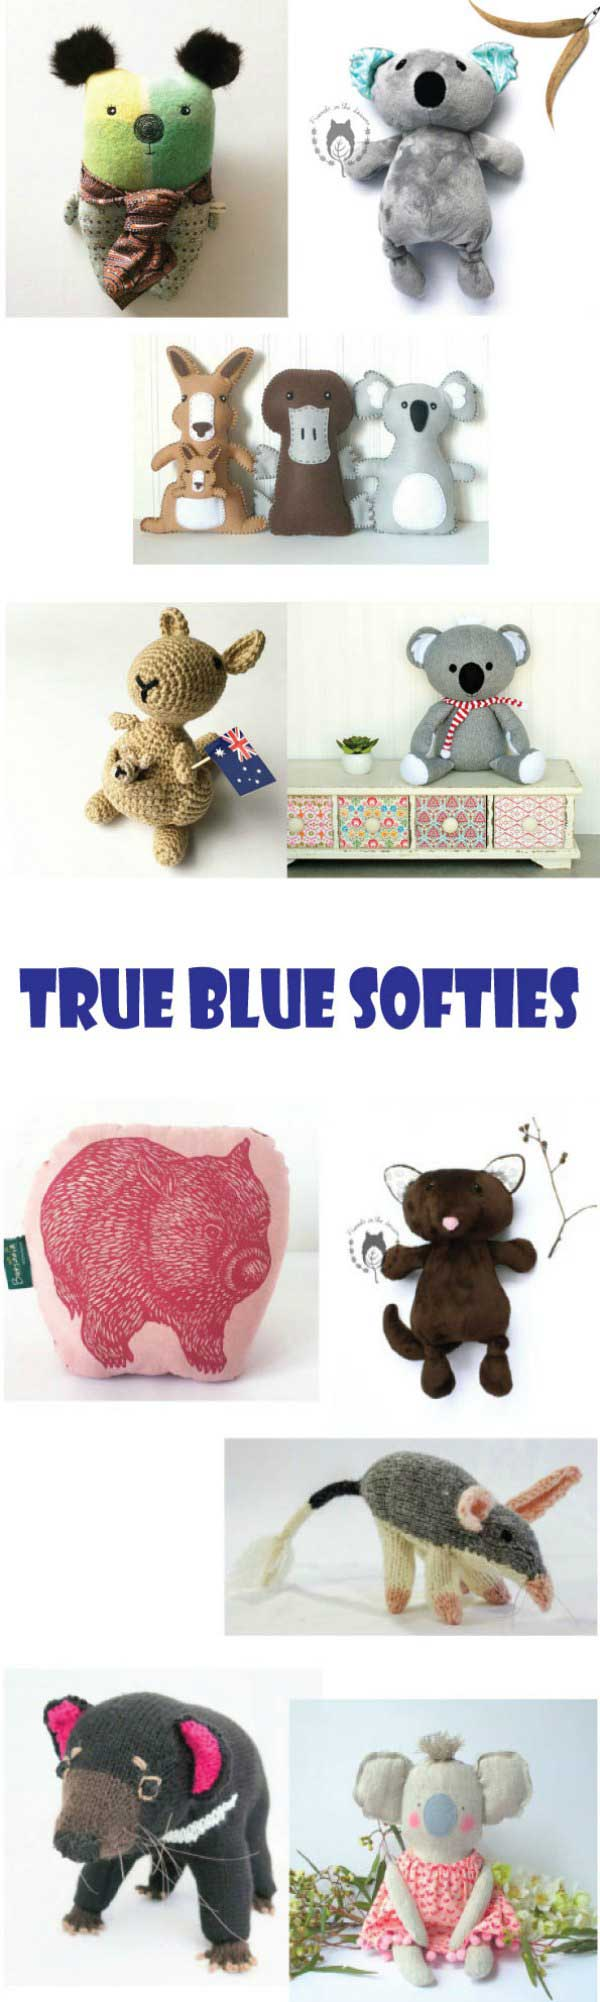 Australian-Soft-Toys